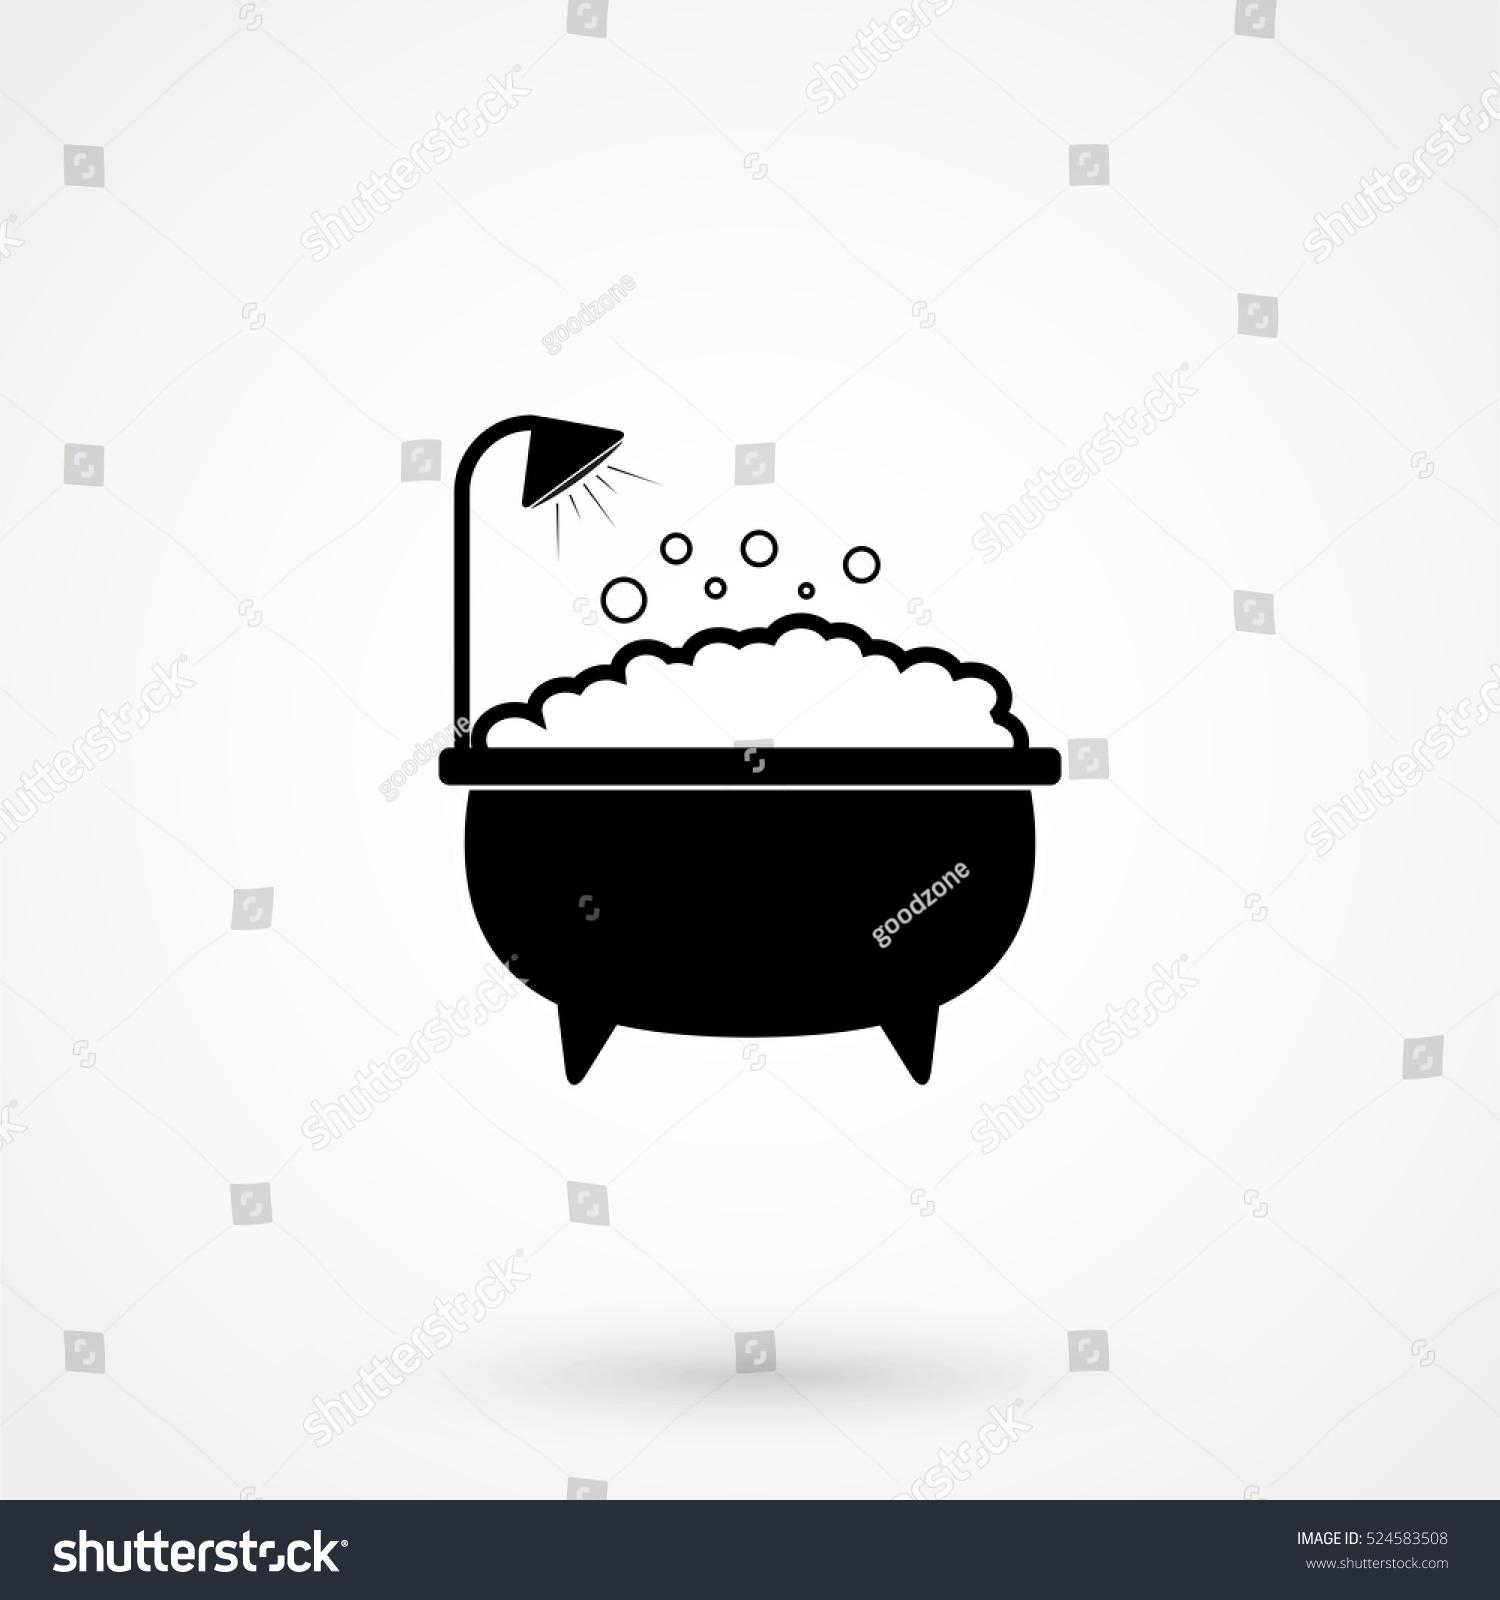 Mobile Bathrooms Concept Bathroom Icon Bath Shower Sign Isolated Stock Vector 524583508 .